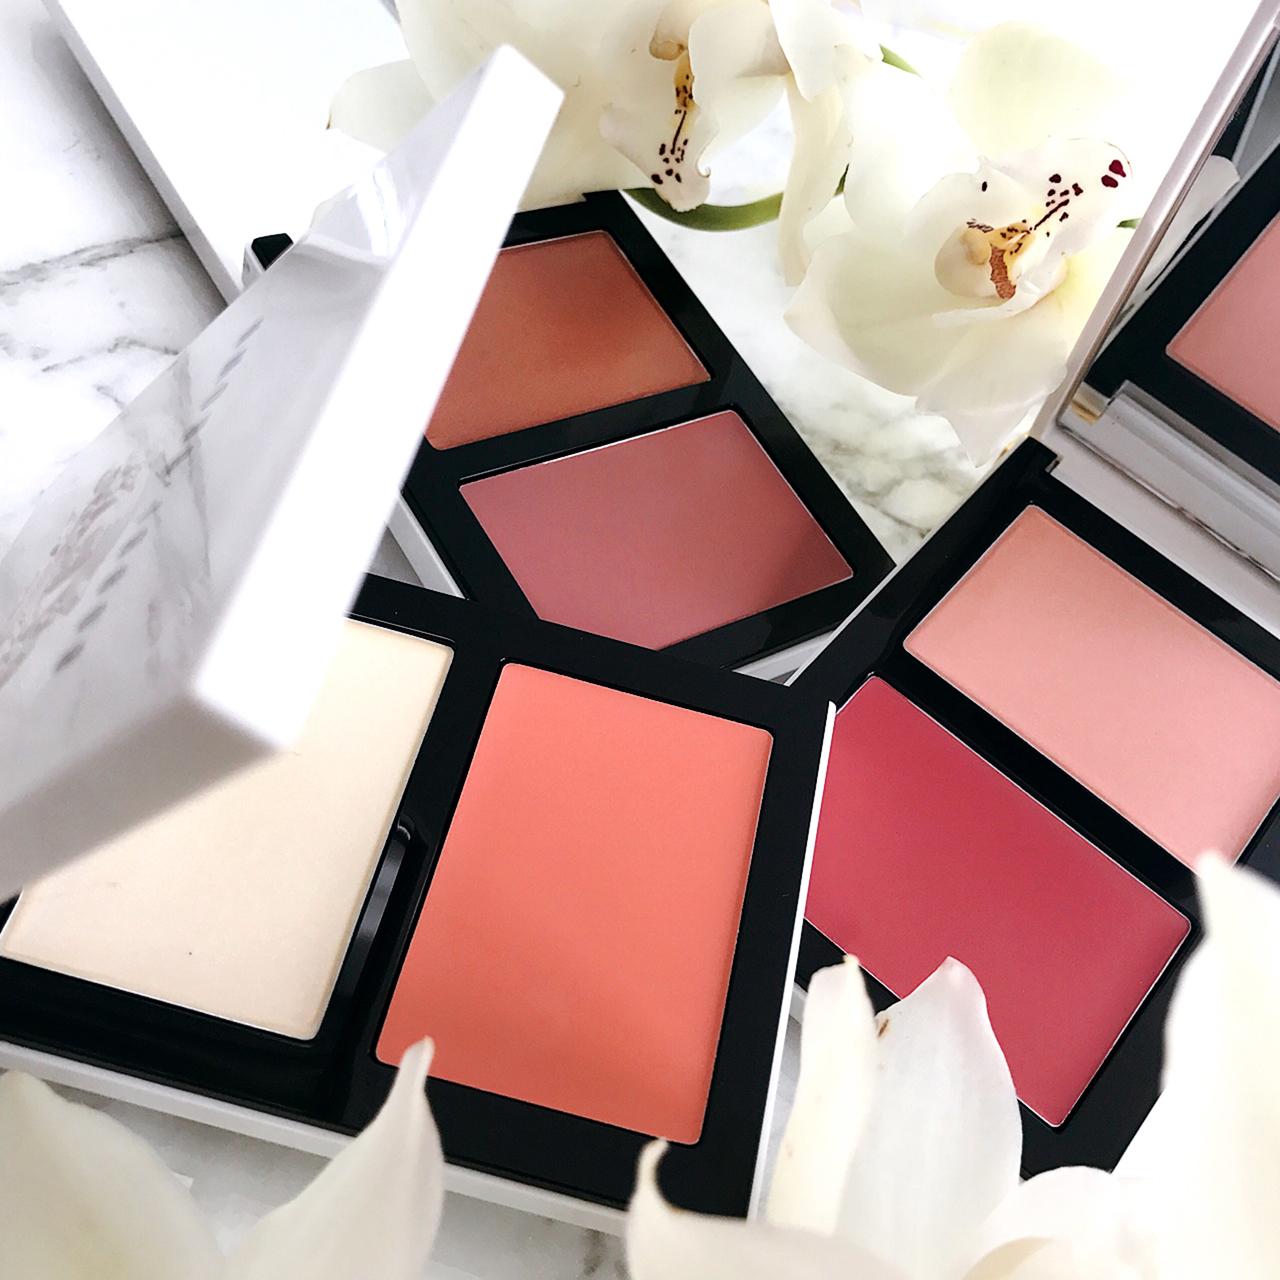 Bobbi Brown Cheek Glow Palettes for Spring 2017